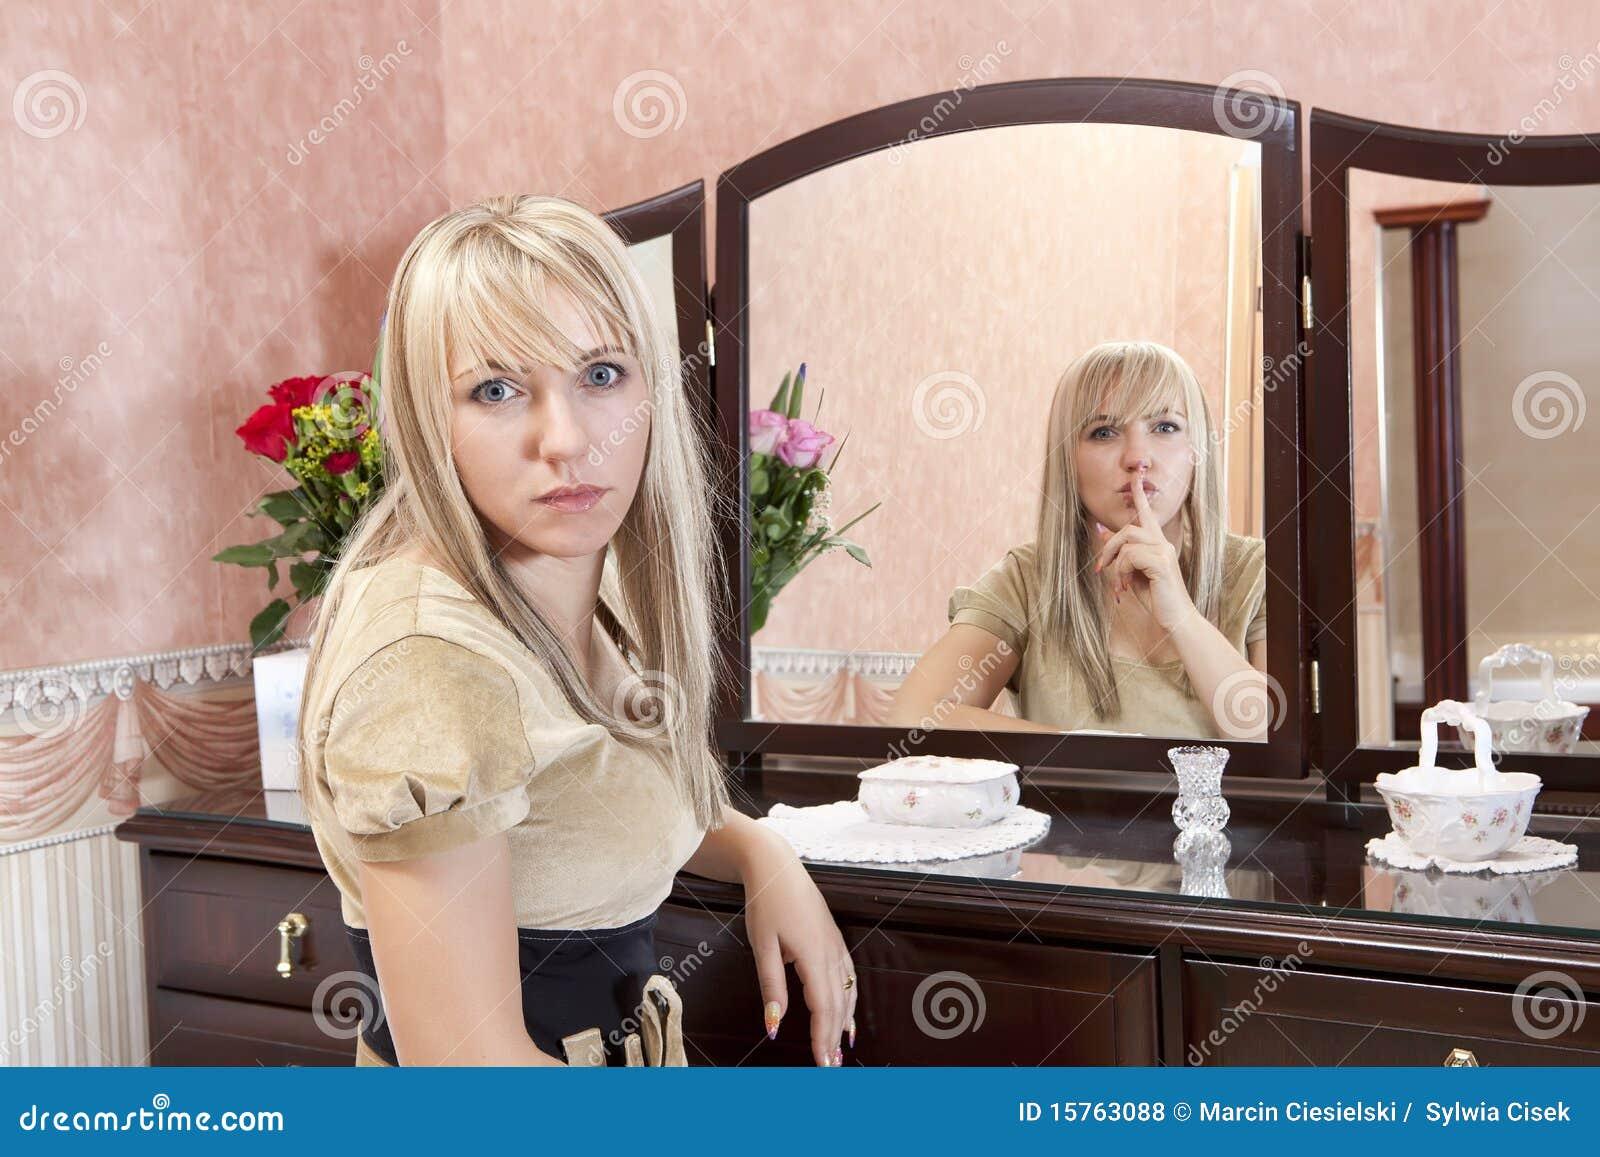 Weird reflexion